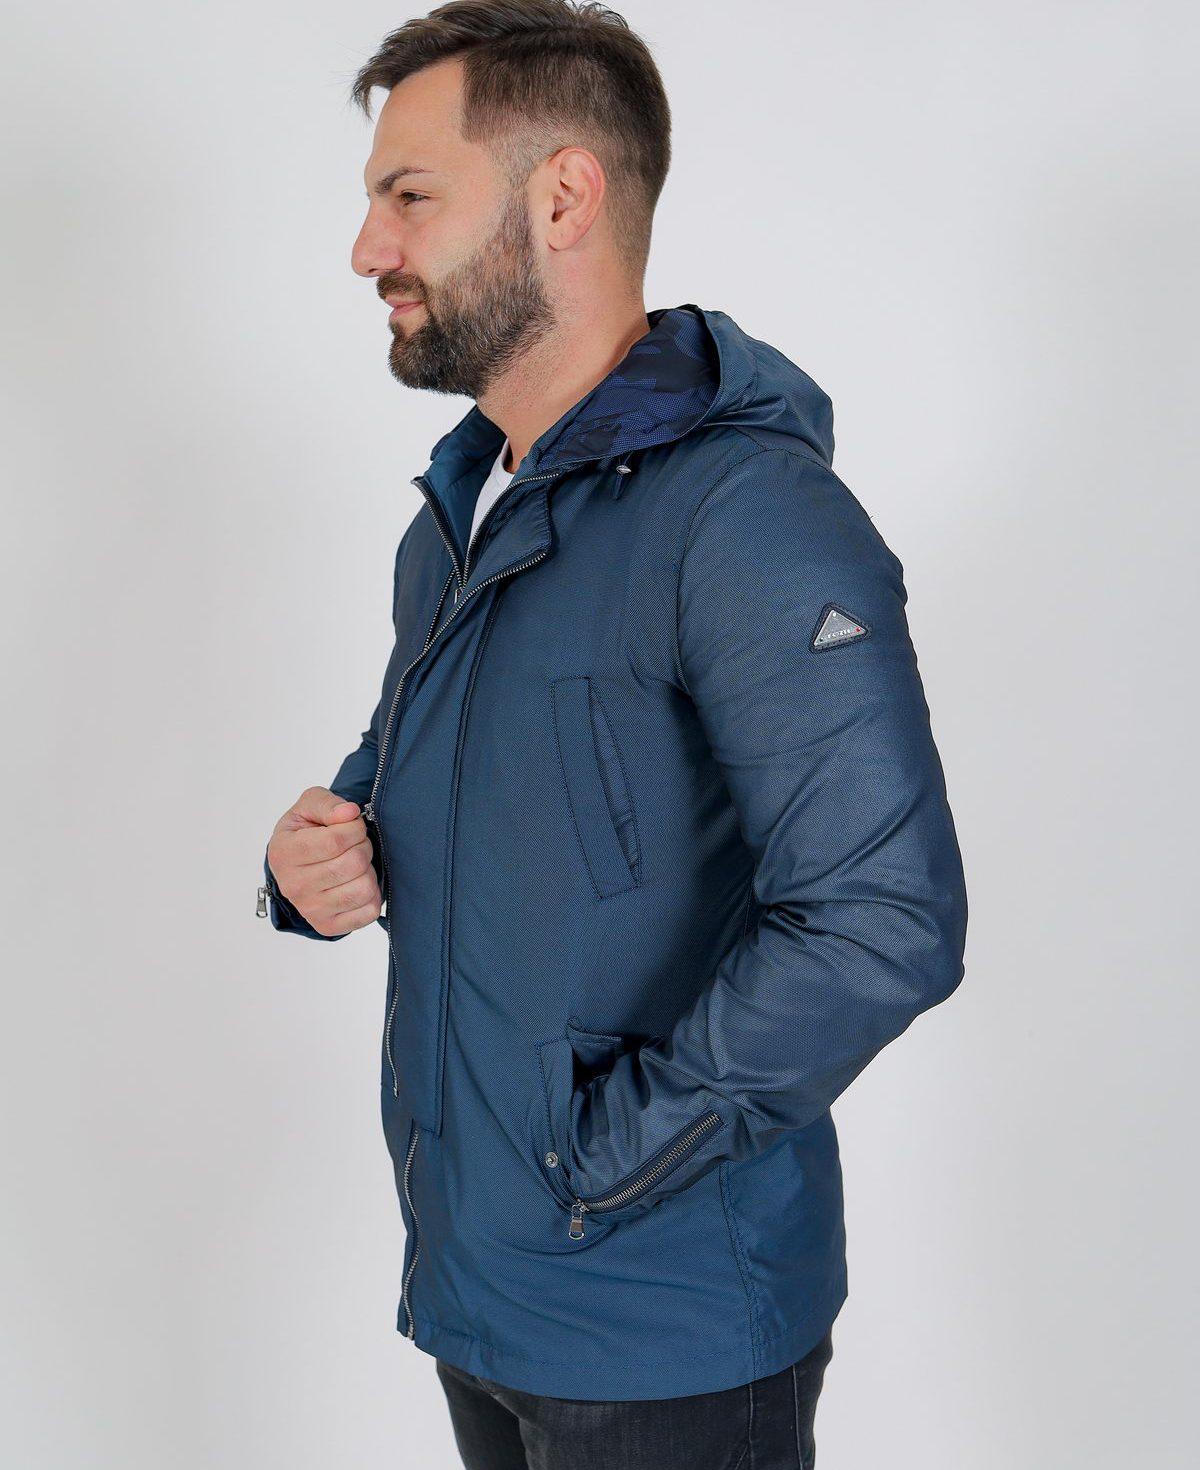 Muška jakna ForteFashion model A7